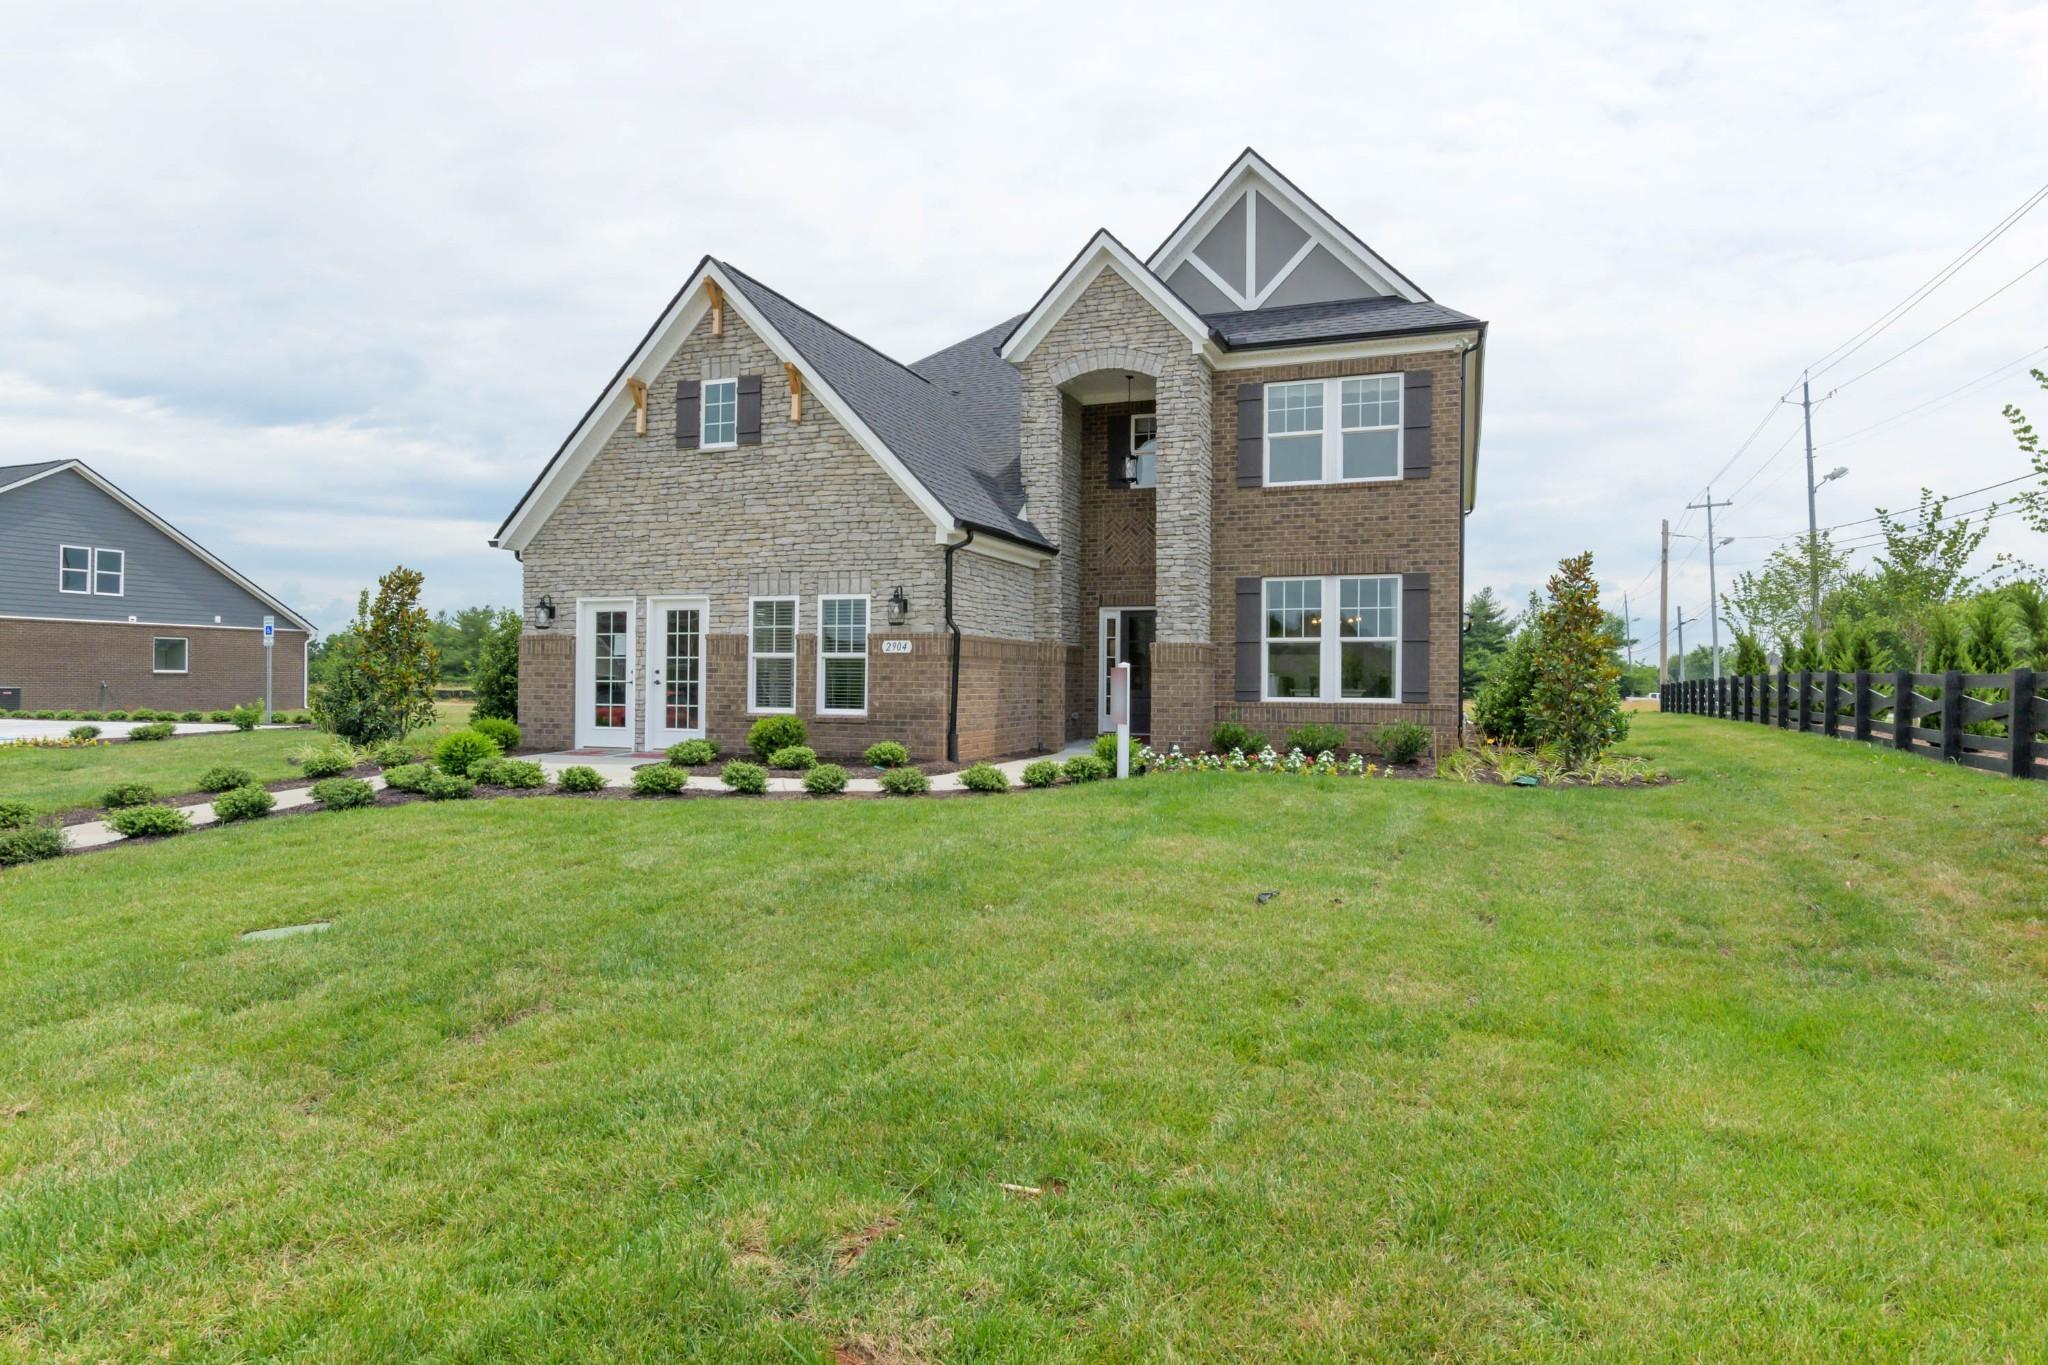 807 Corlew St. Property Photo - Murfreesboro, TN real estate listing